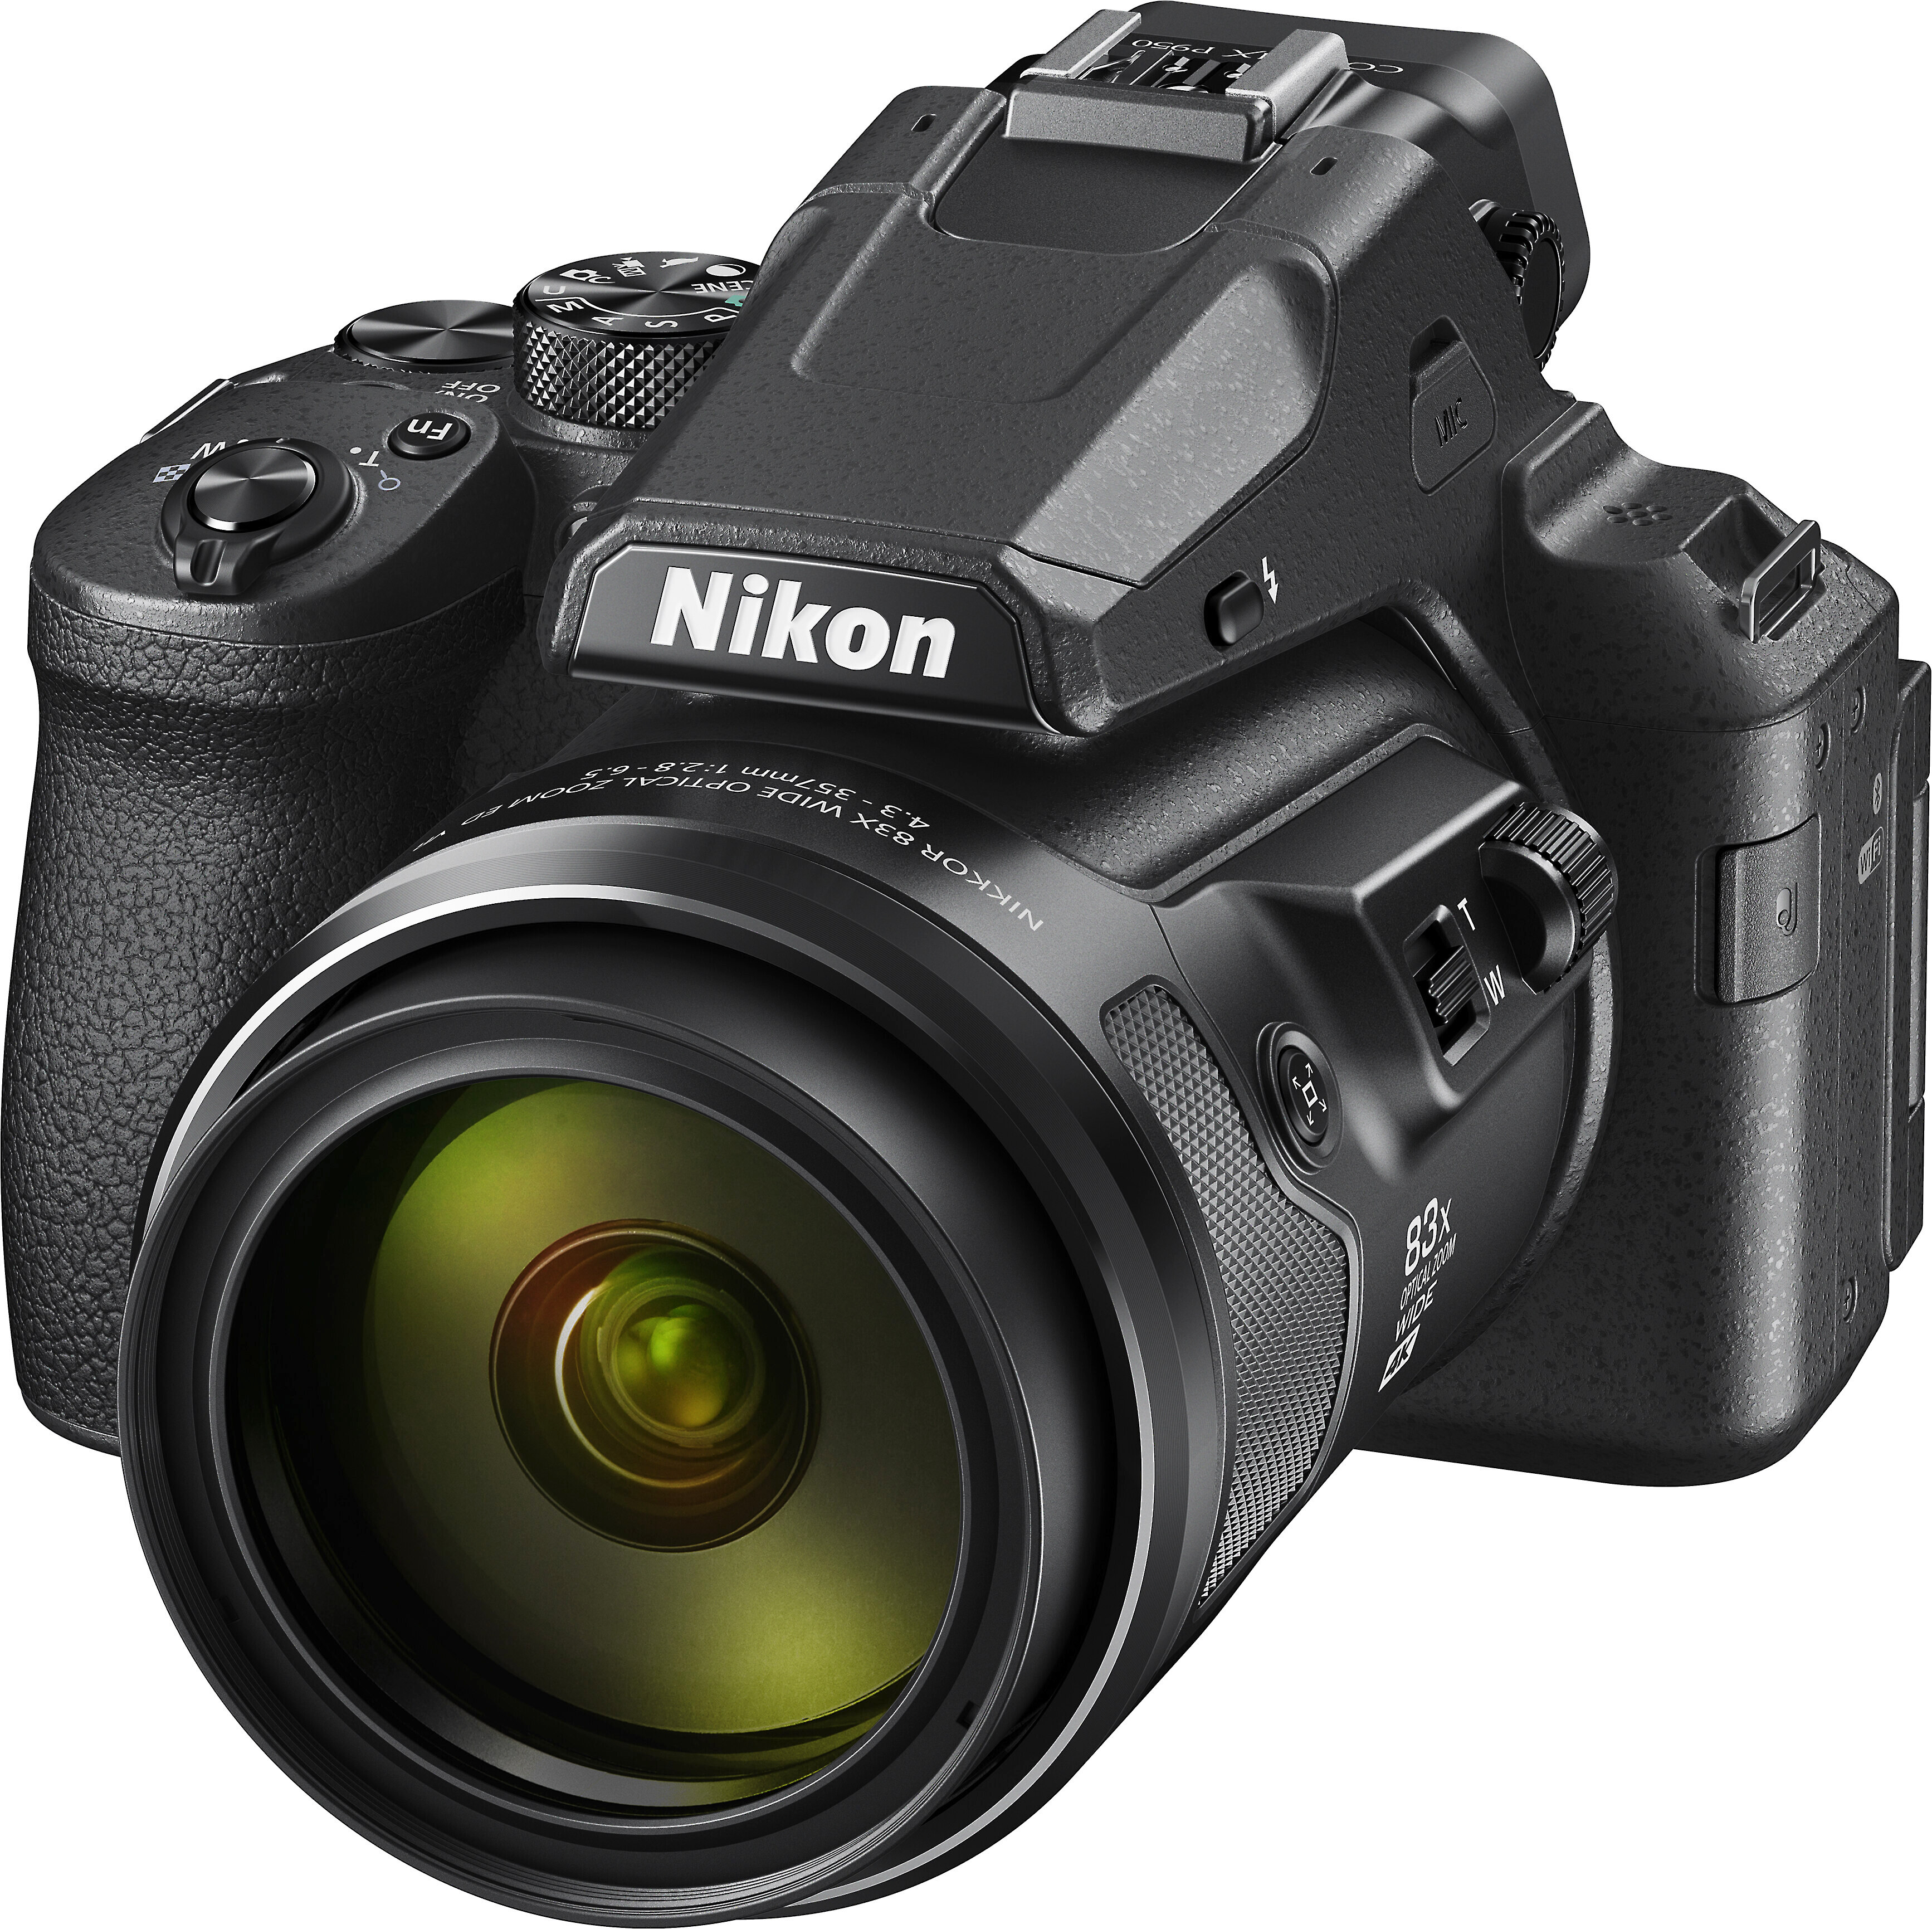 Best Tech Gifts of 2020 - nikon camera